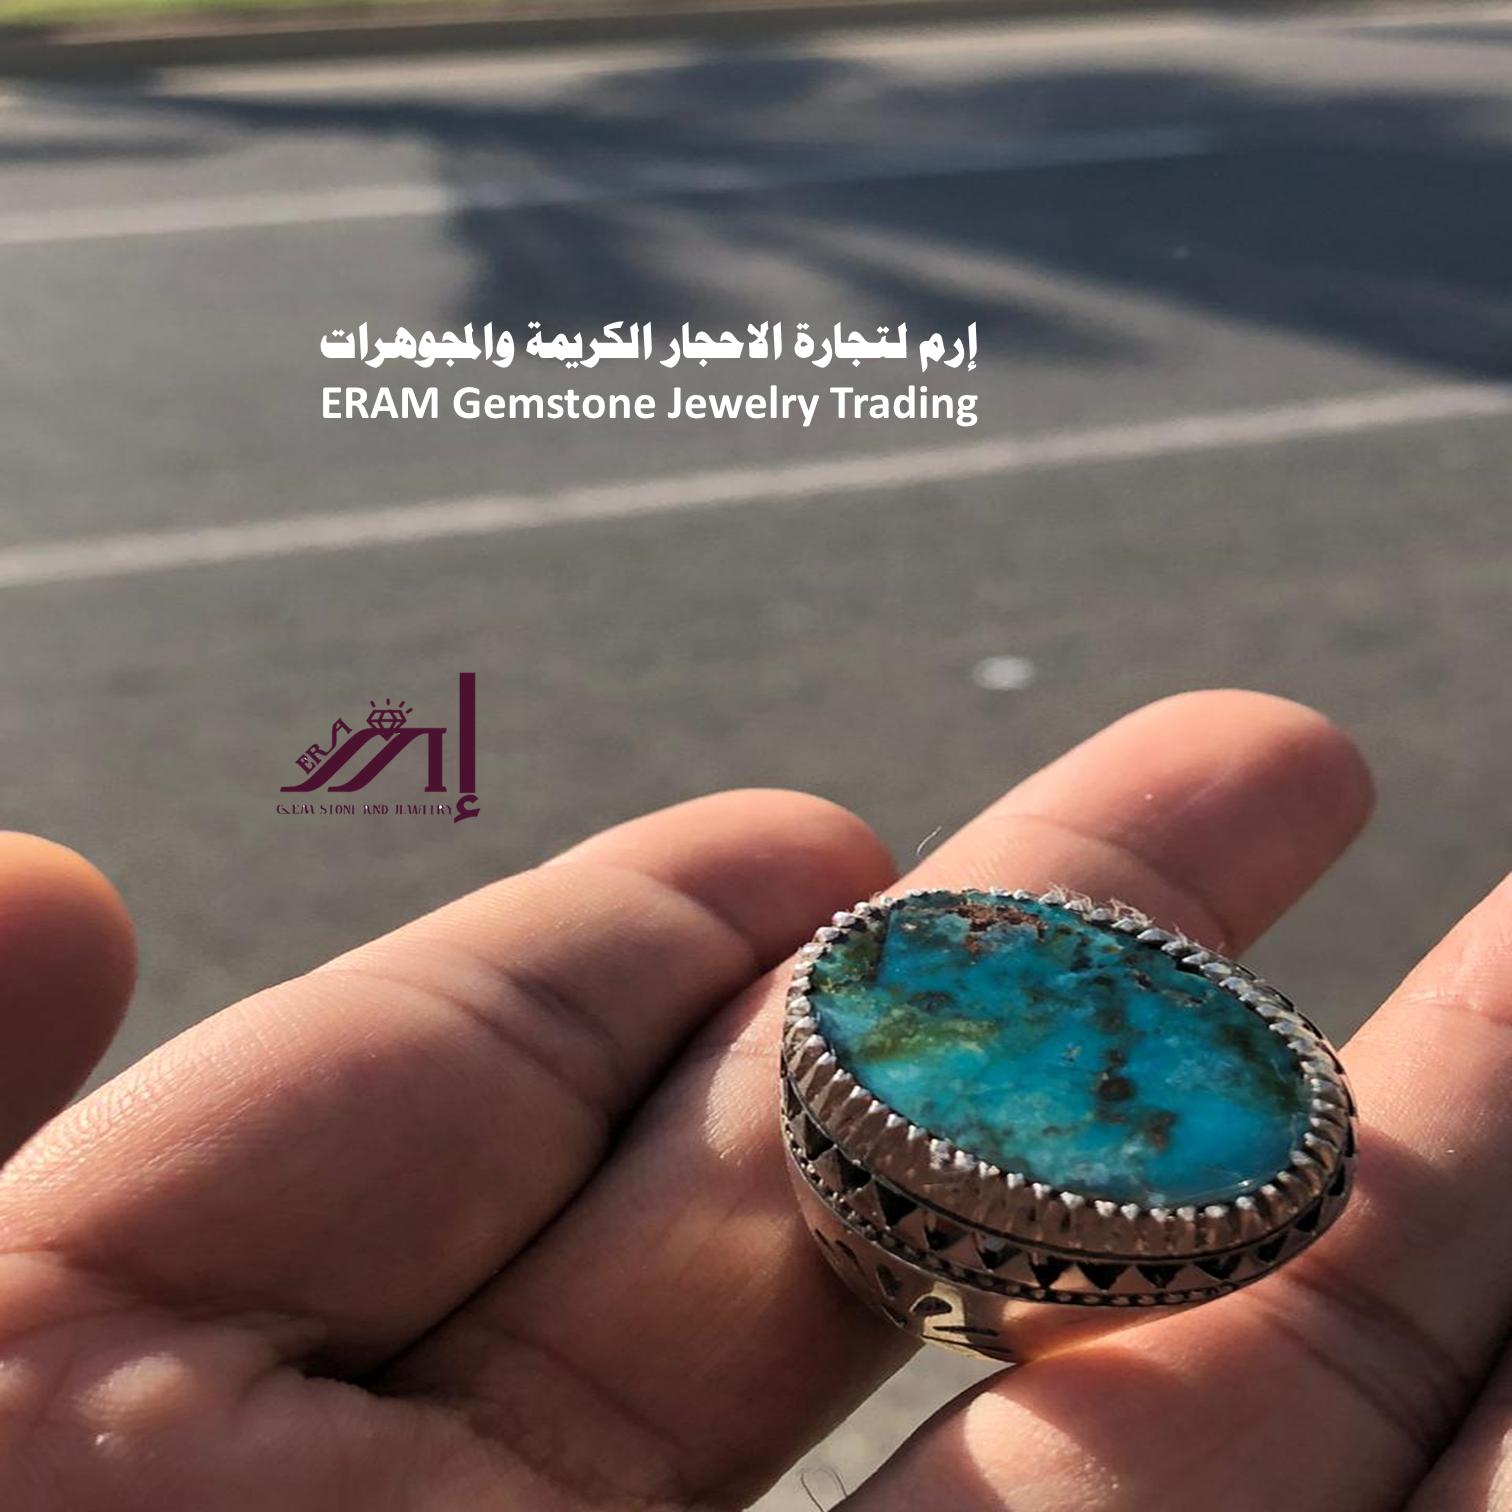 تألقي طيلة اليوم كوني مميزة خاتم نسائي عصري فيروز نيشابوري مسطح بيضاوي طبيعي 100 Turquoise Gemstones Gemstone Jewelry Turquoise Ring